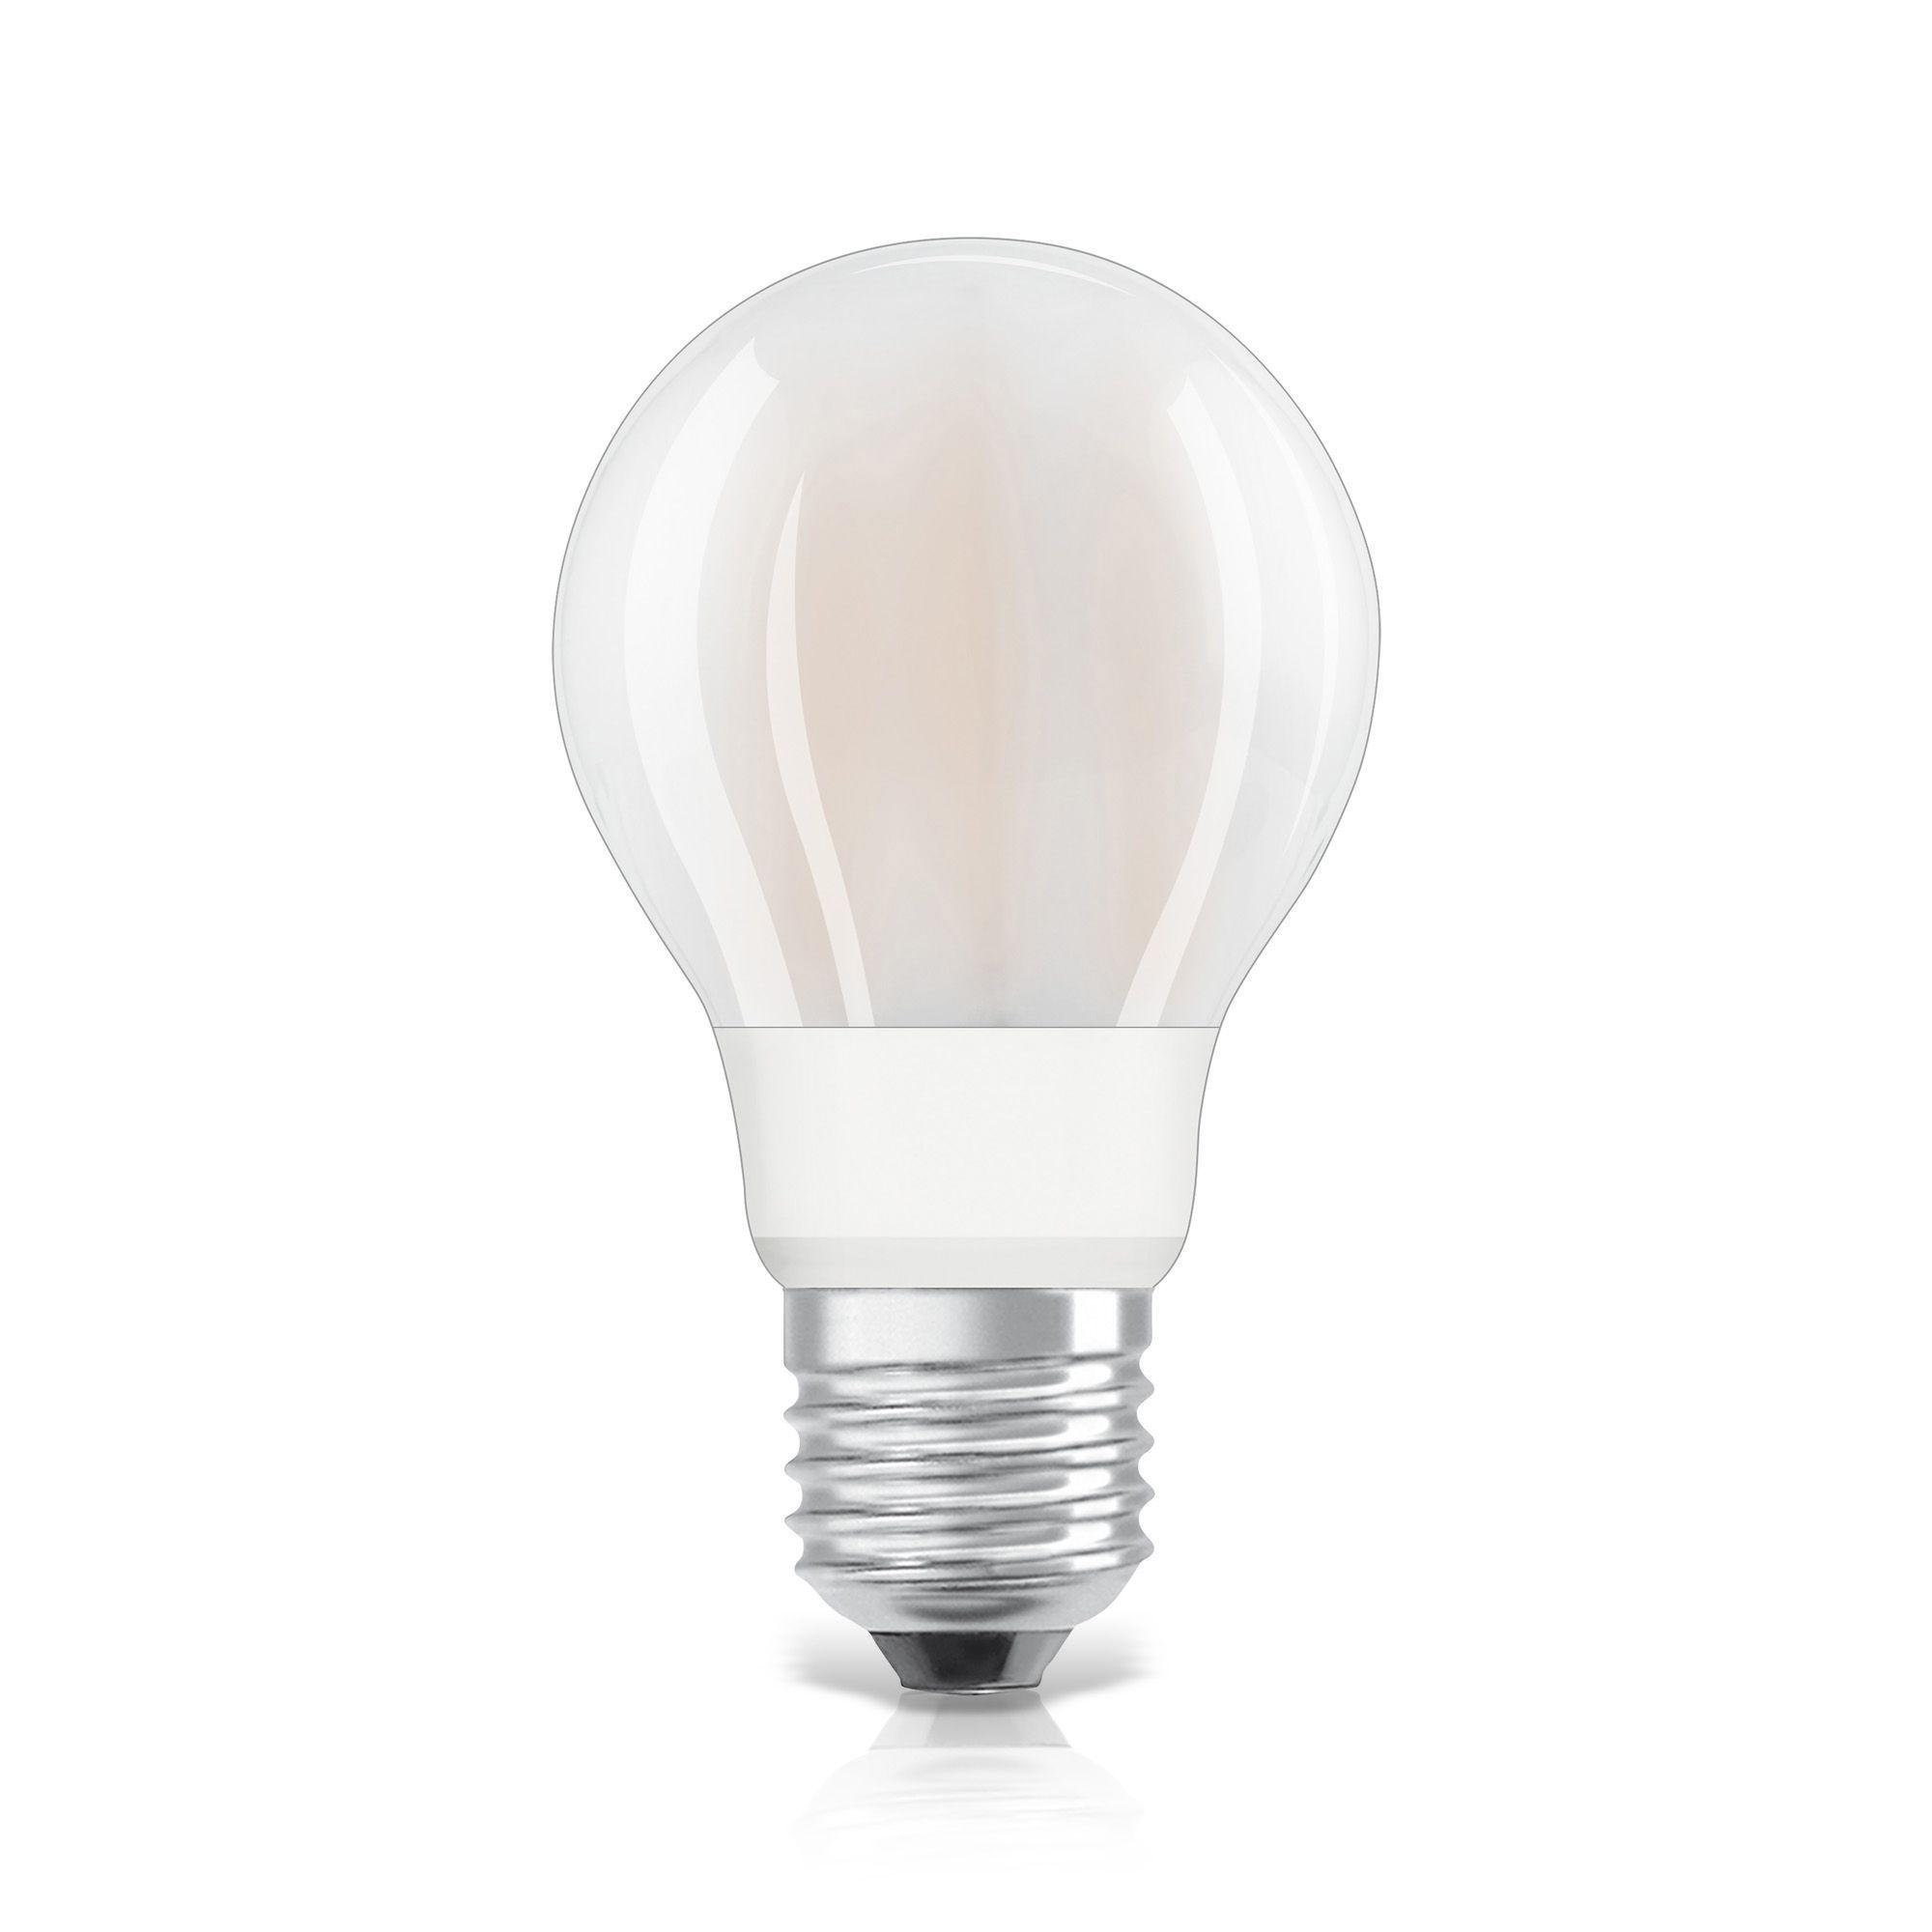 Osram LED SUPERSTAR RETROFIT diffuse DIM CLA 100 12W 840 E27 4000K 1521lm